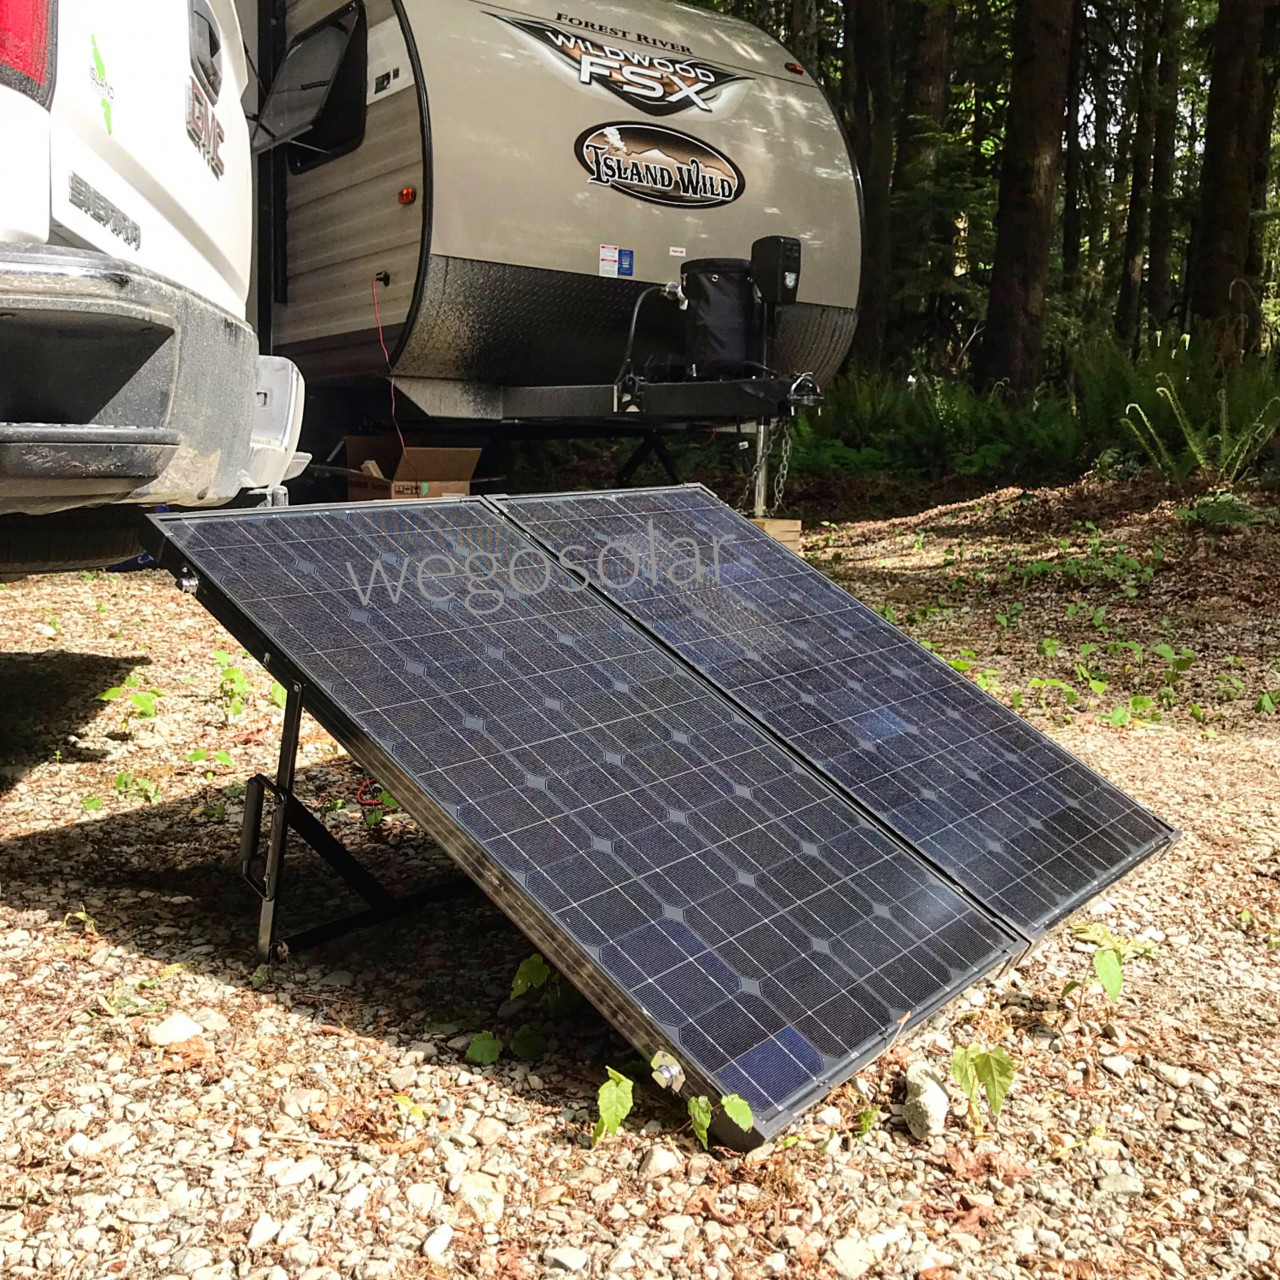 180W Folding Solar Panel Kit - We Go Solar Canada